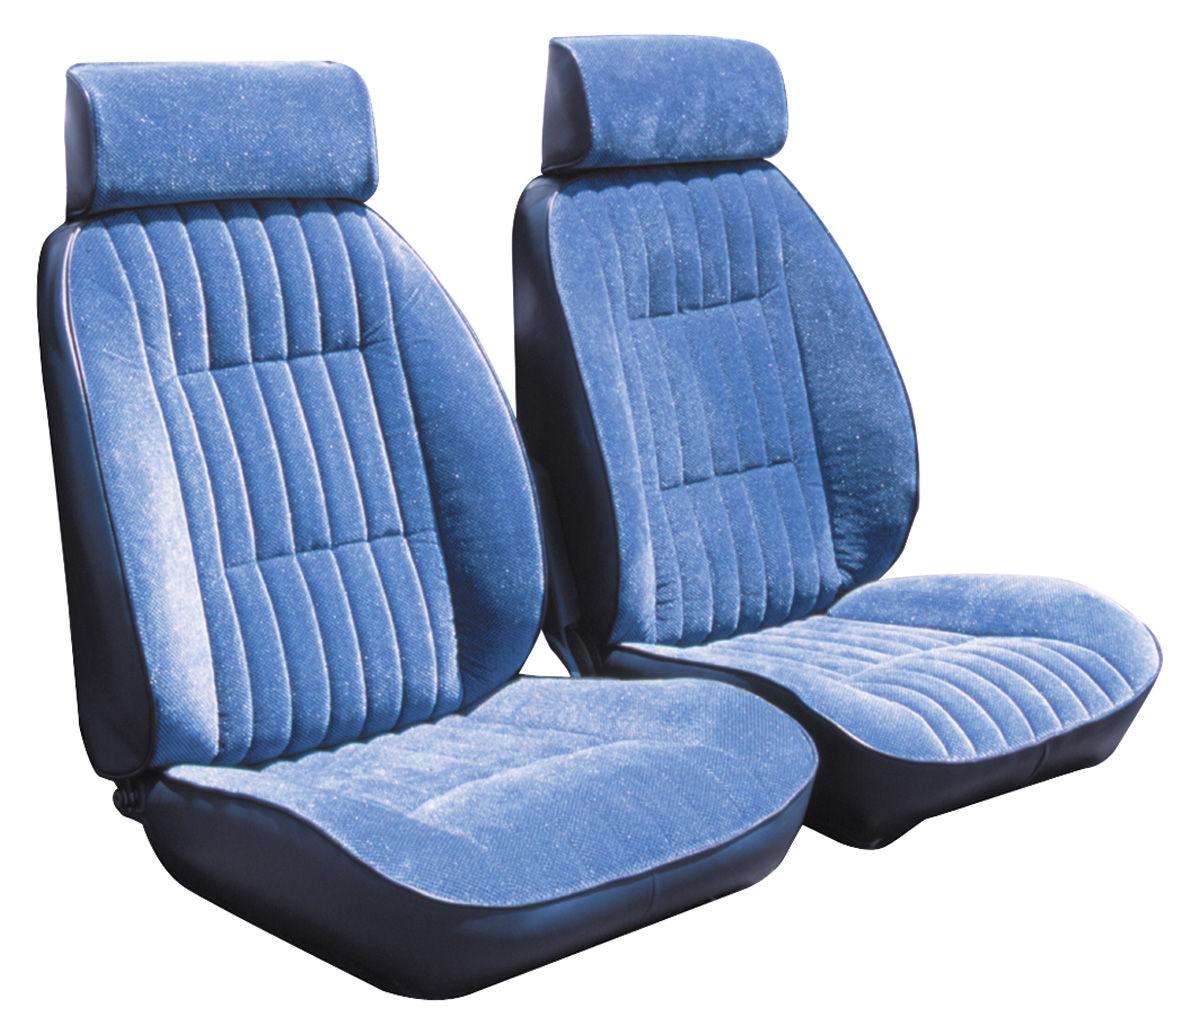 Peachy Seat Upholstery 1984 87 El Camino Reclining Front Buckets Regal Cloth Inzonedesignstudio Interior Chair Design Inzonedesignstudiocom